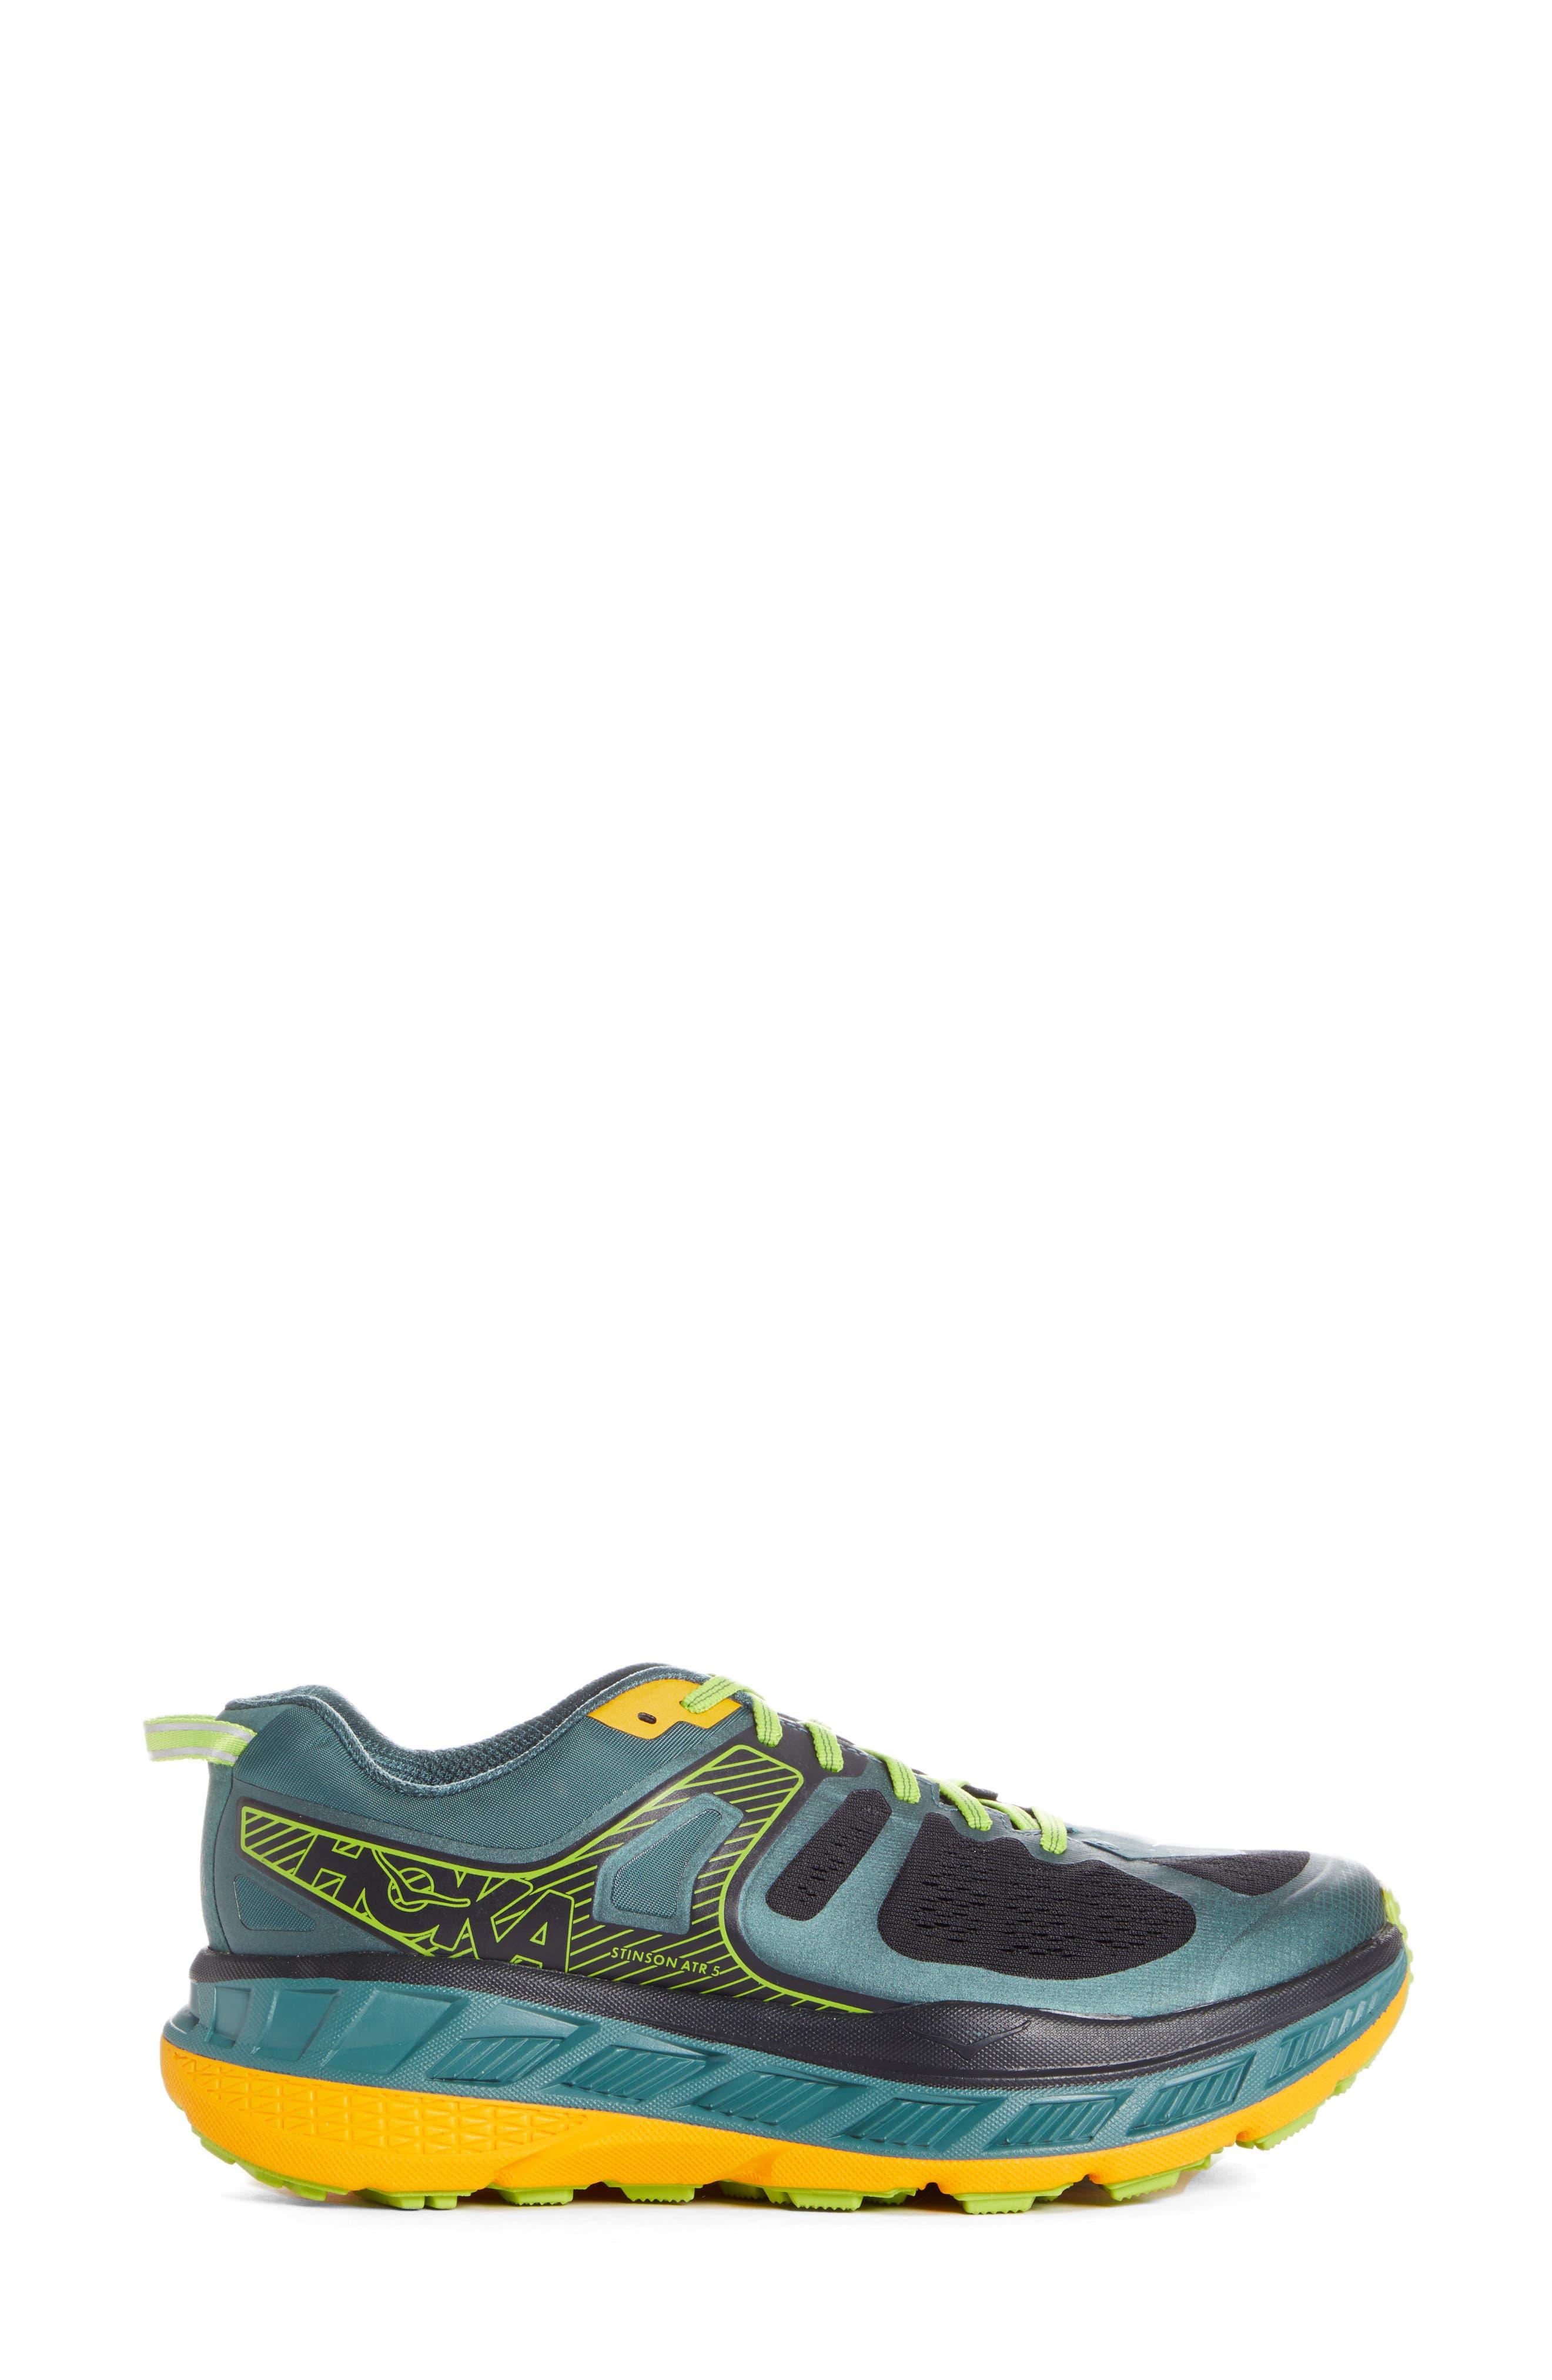 Hoka One One Stinson Atr 5 Trail Running Shoe, Green